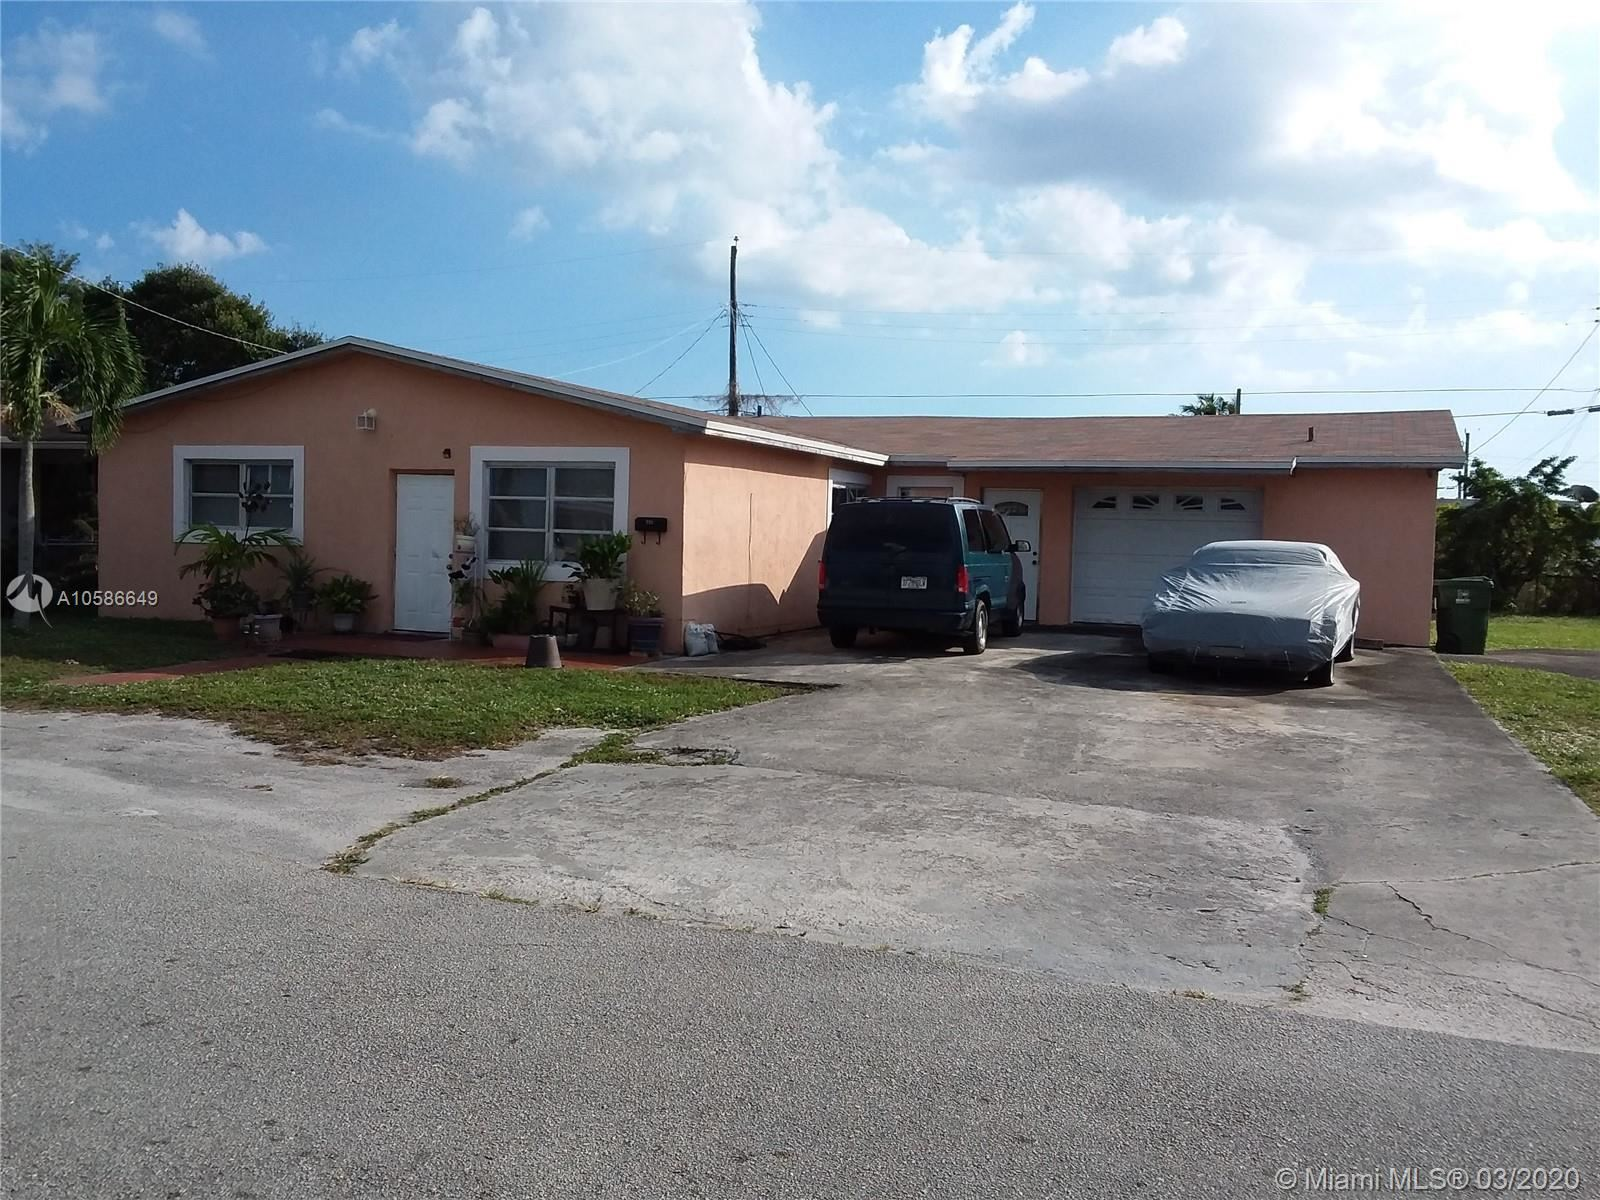 721 NW 4th, Hallandale Beach, FL 33309 - #: A10586649